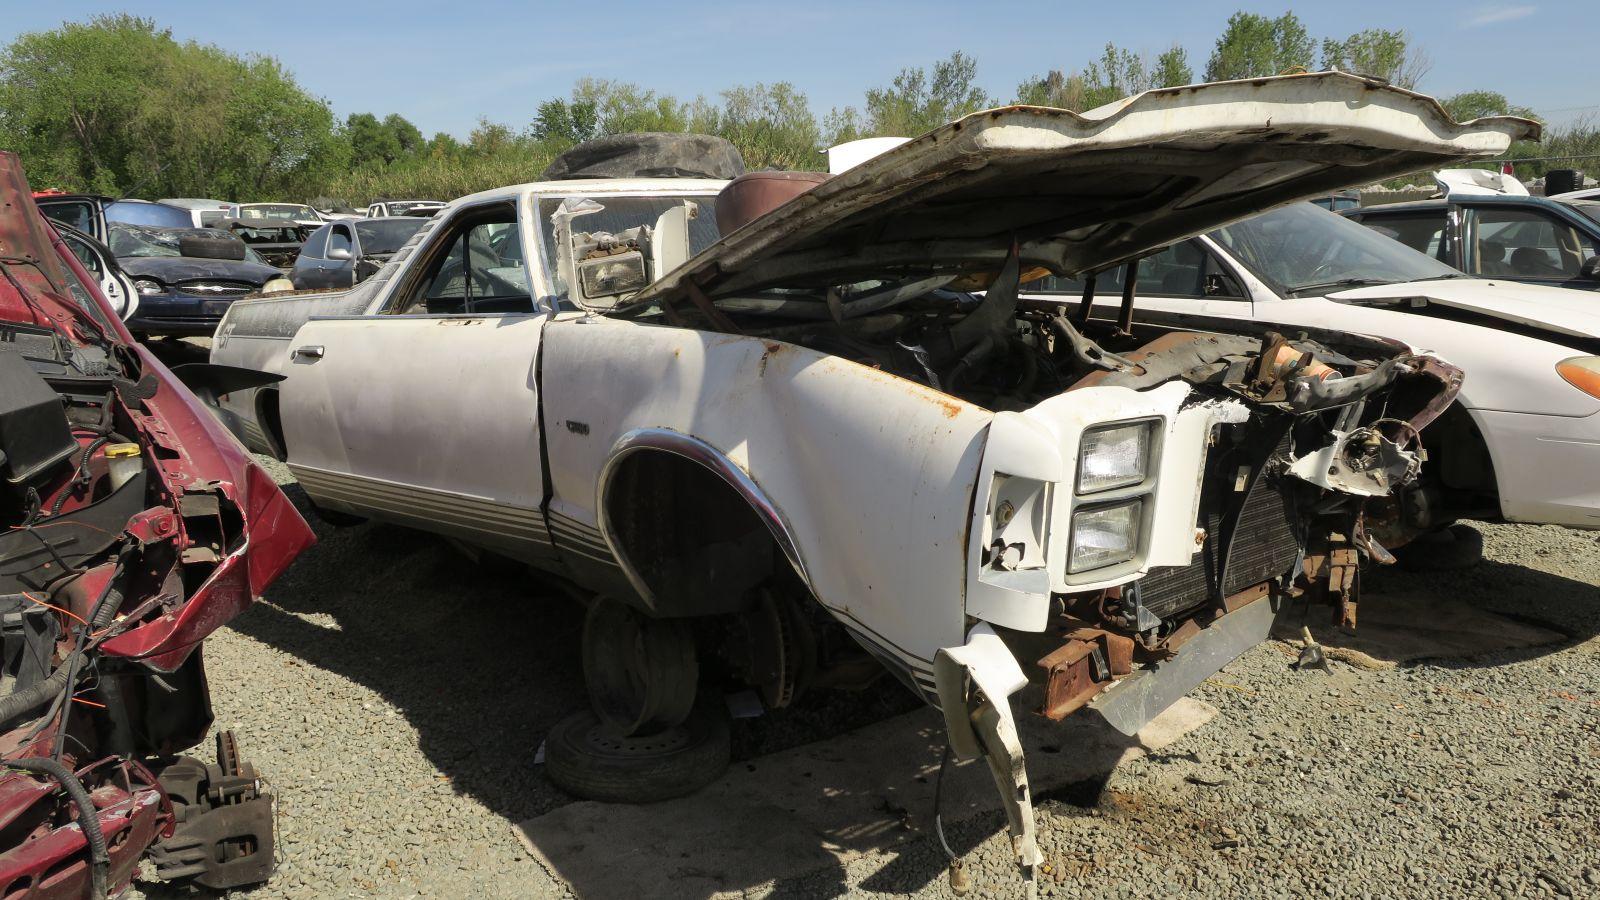 Джанкиард Найдено: 1977 Ford Ranchero GT Brougham